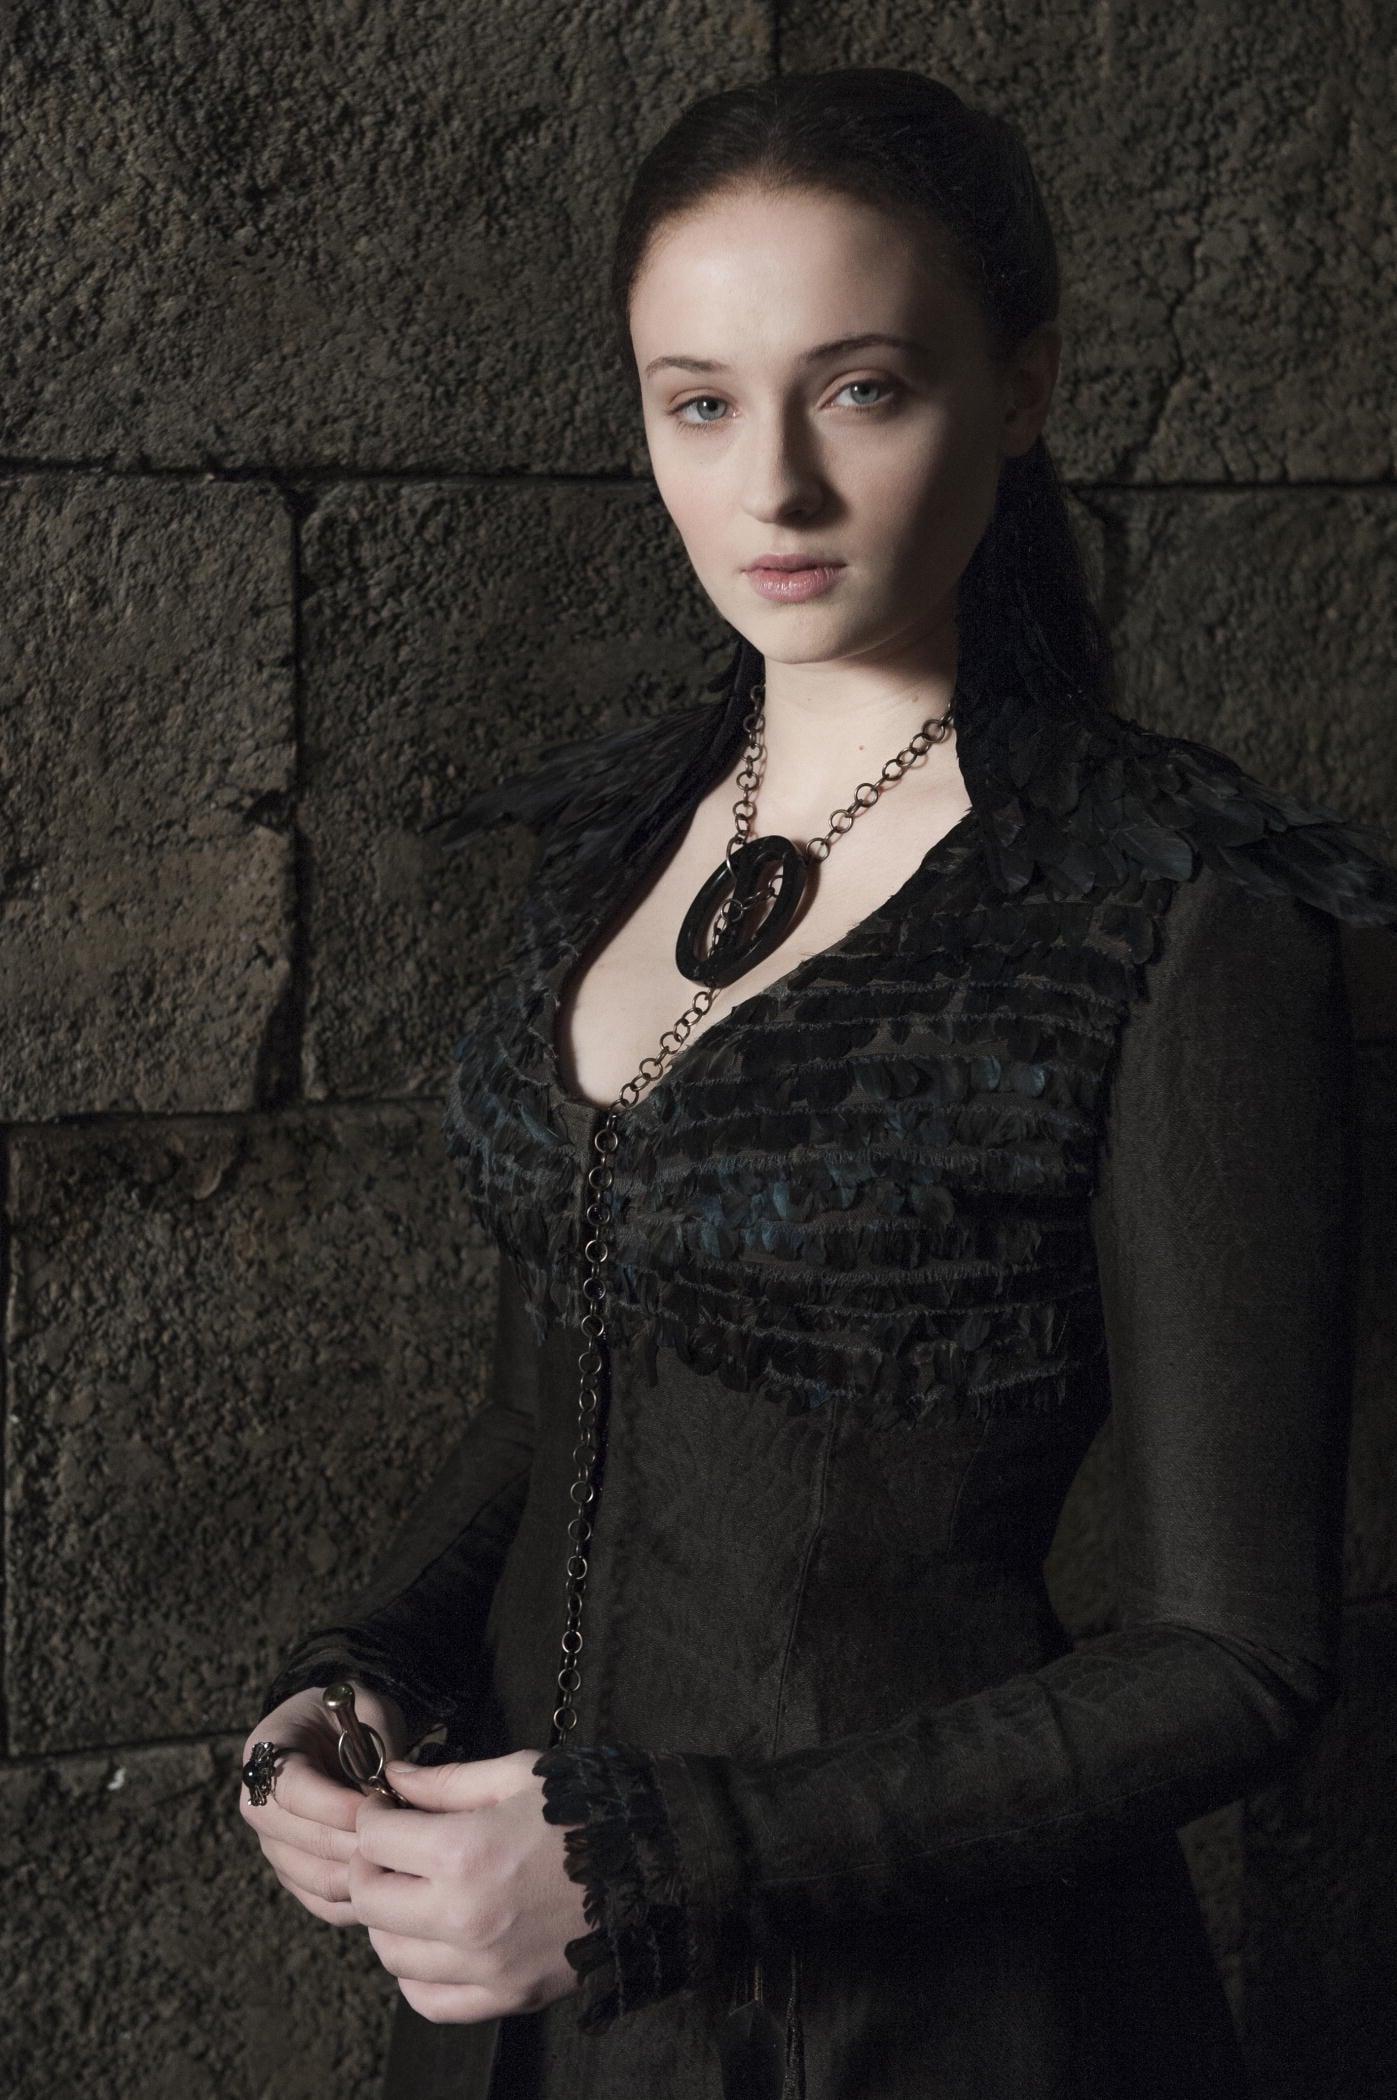 Sansa Is the New Maleficent?